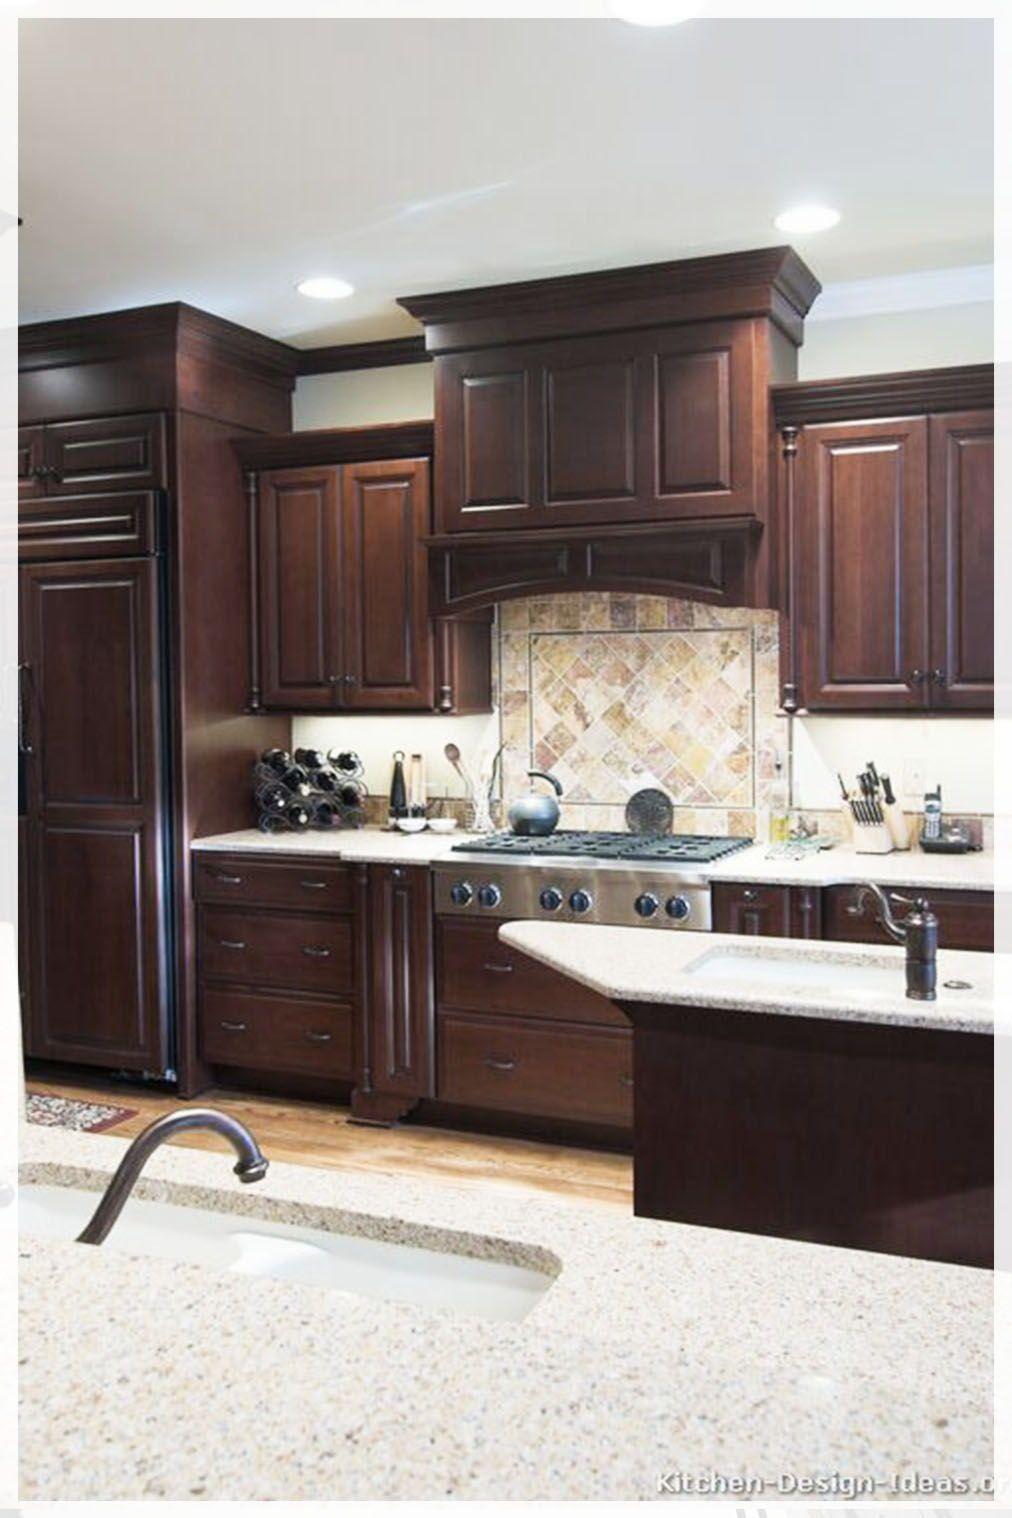 20 Stunning Industrial Style Kitchen 2020 Trends Key Elements Design Ideas In 2020 Cherry Cabinets Kitchen Cherry Wood Kitchen Cabinets Cherry Wood Cabinets